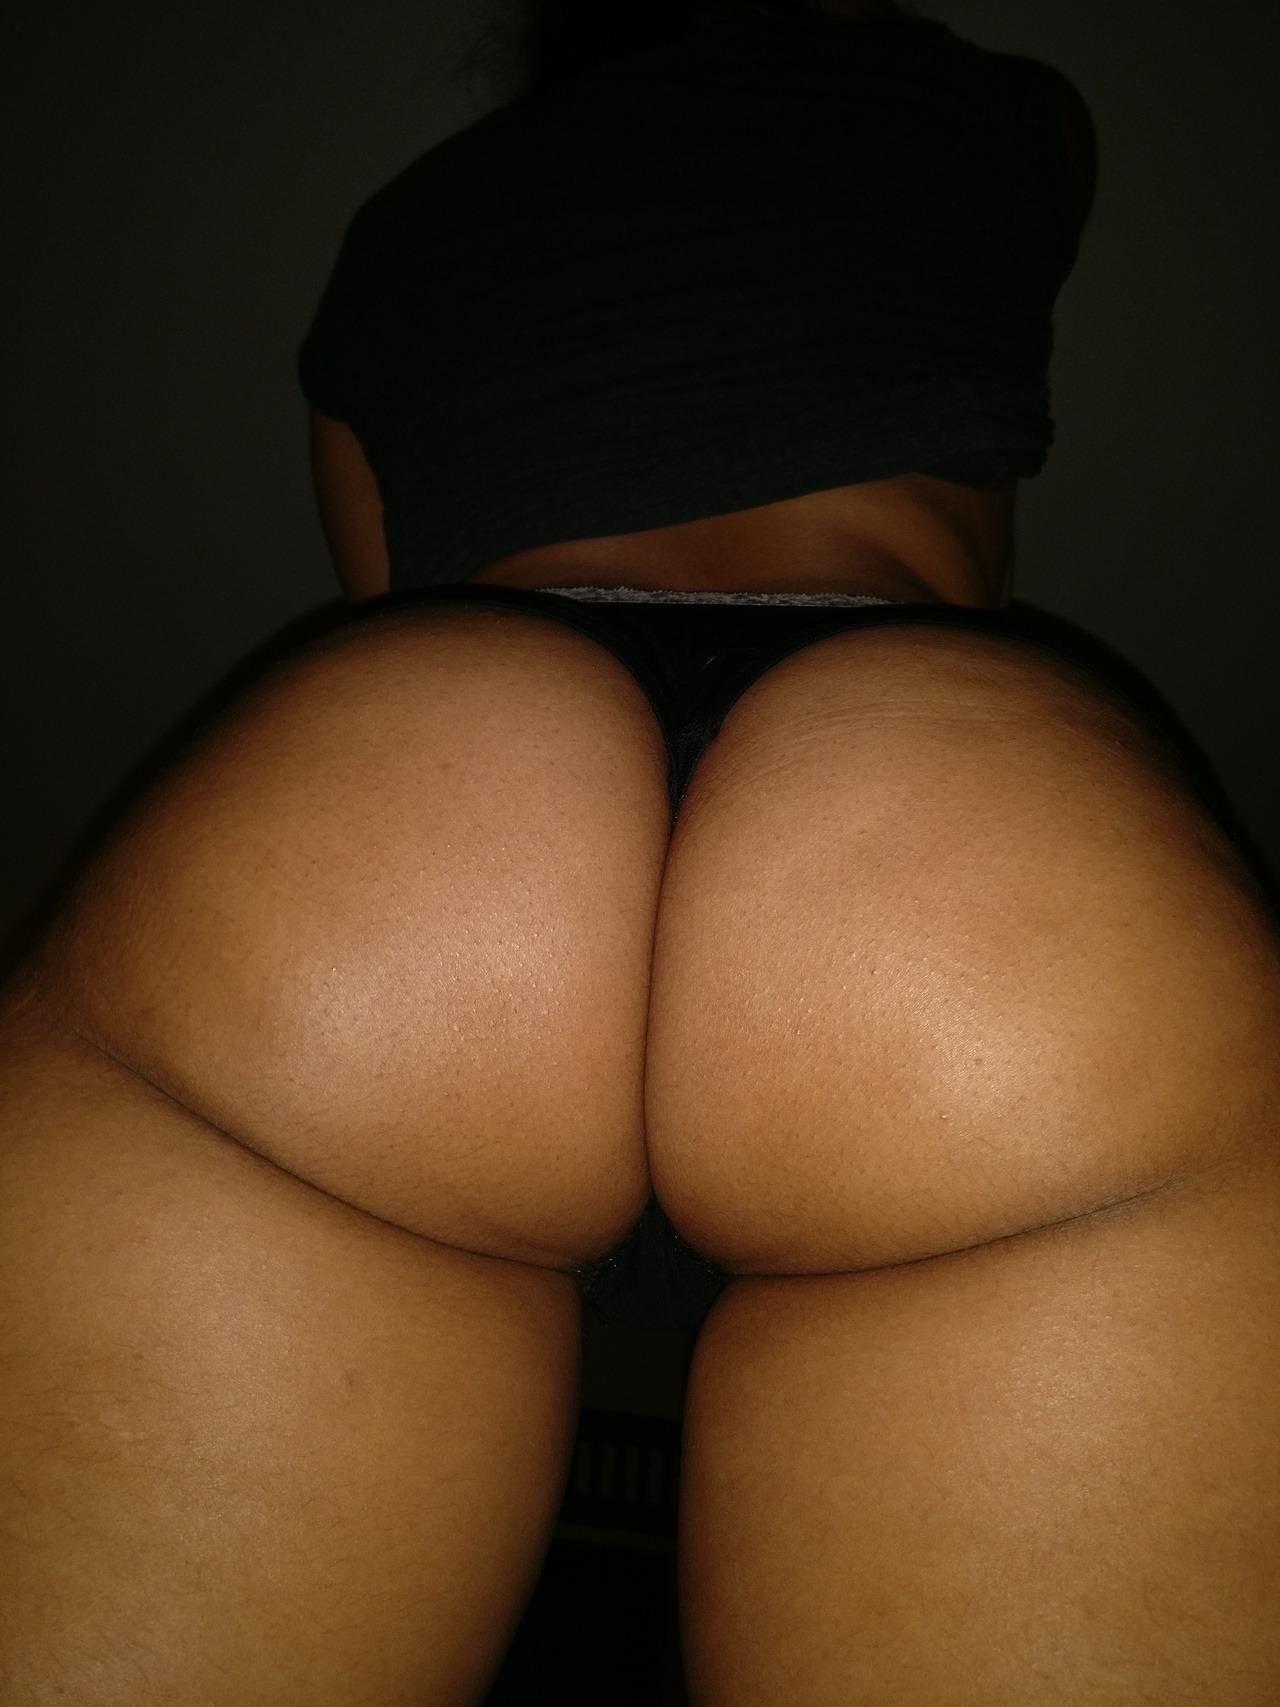 Free big black tits porn videos booty shake  ebony sex.com single parent dating downey idaho